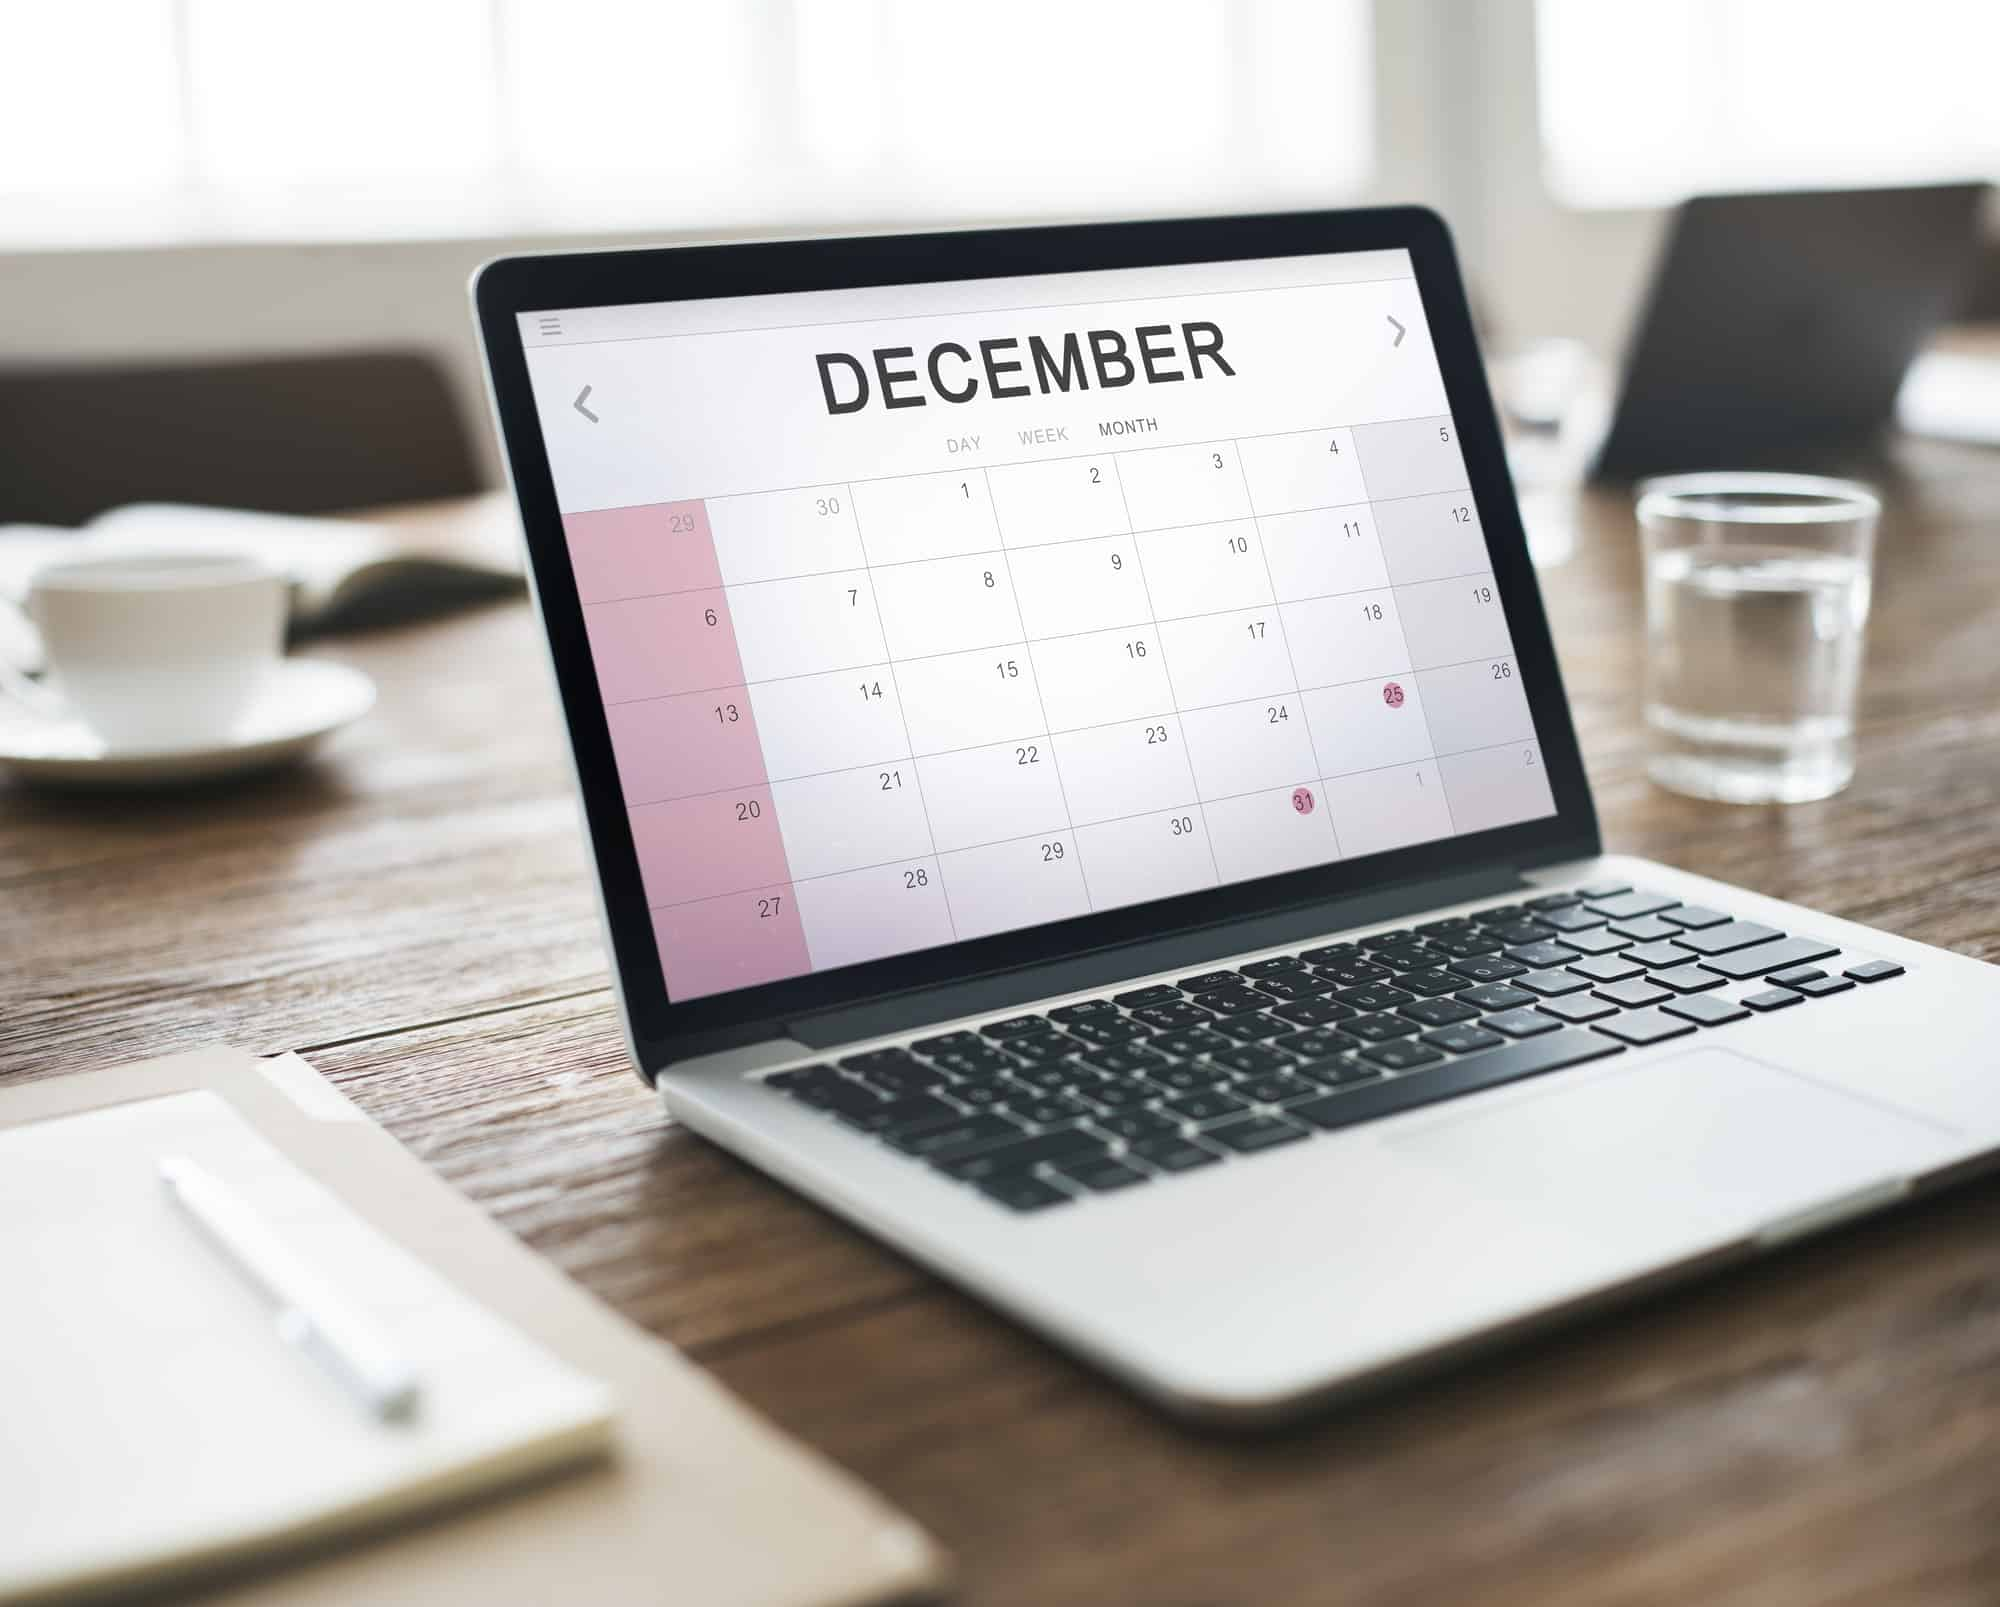 December Monthly Calendar Weekly Date Concept